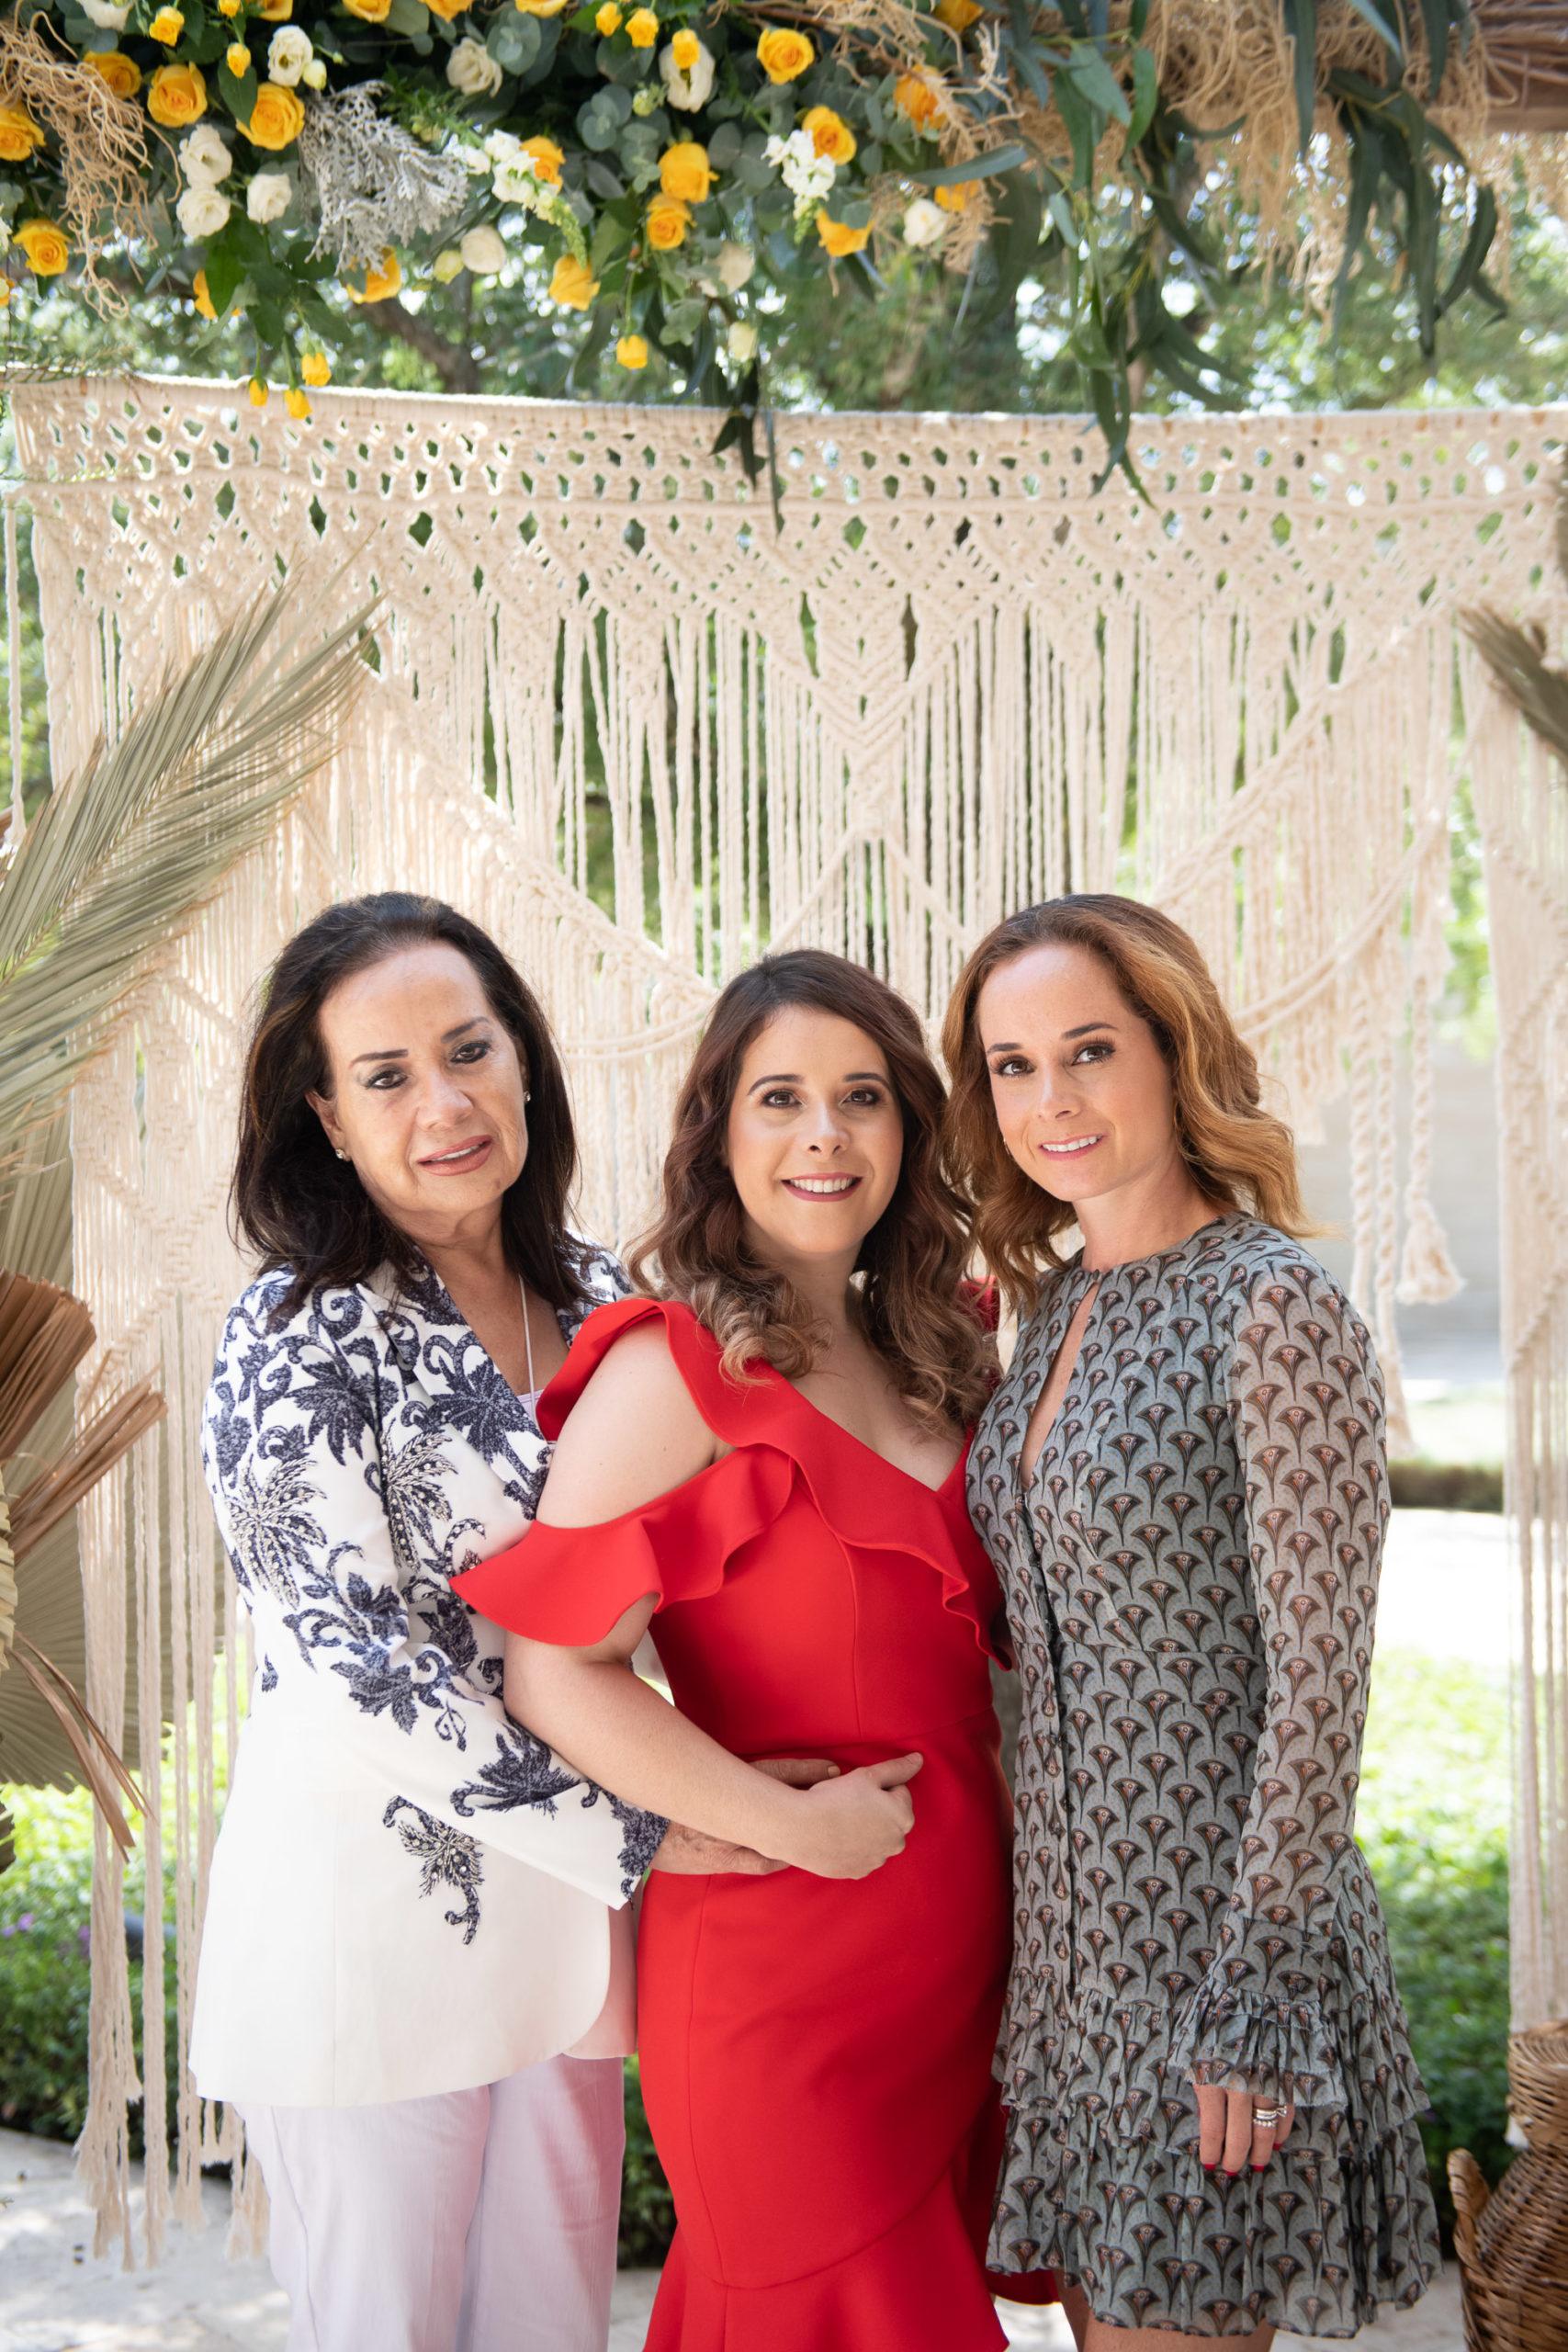 Denise Valdez de Obando, Romy Obando y Denise Ma. Obando de Mohamar.